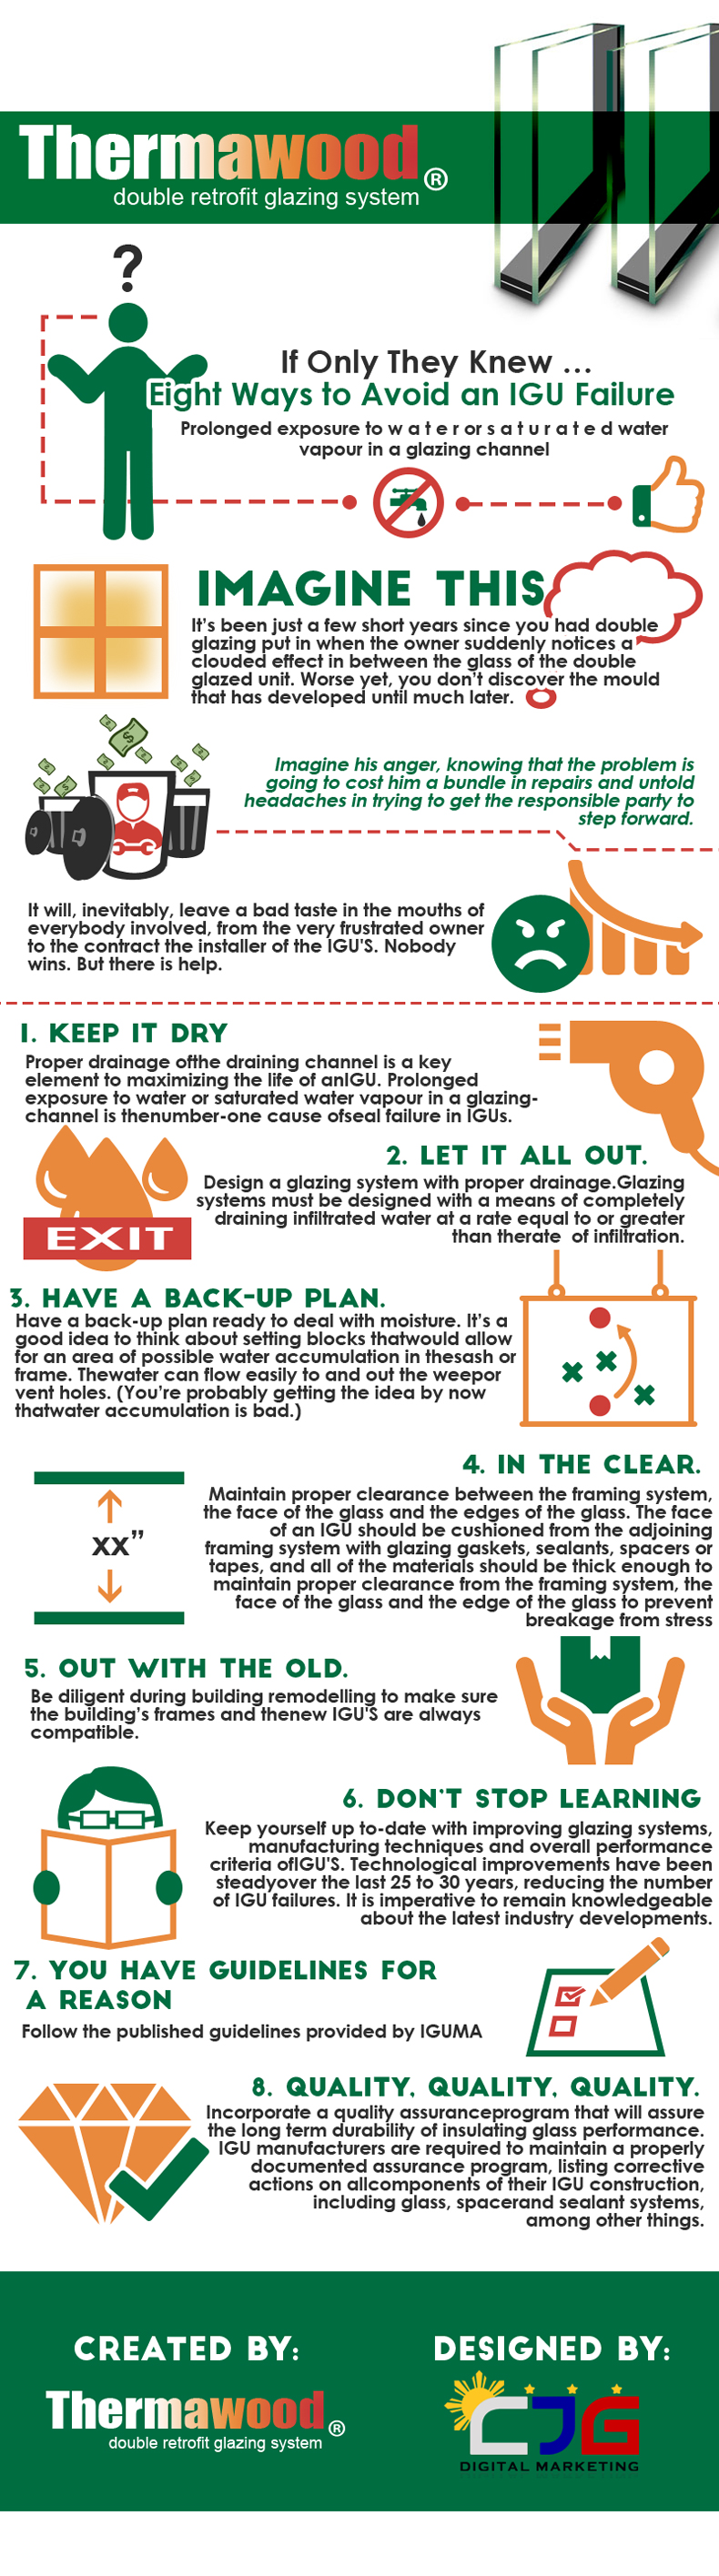 8-Ways-to-Avoid-an-IGU-Failure